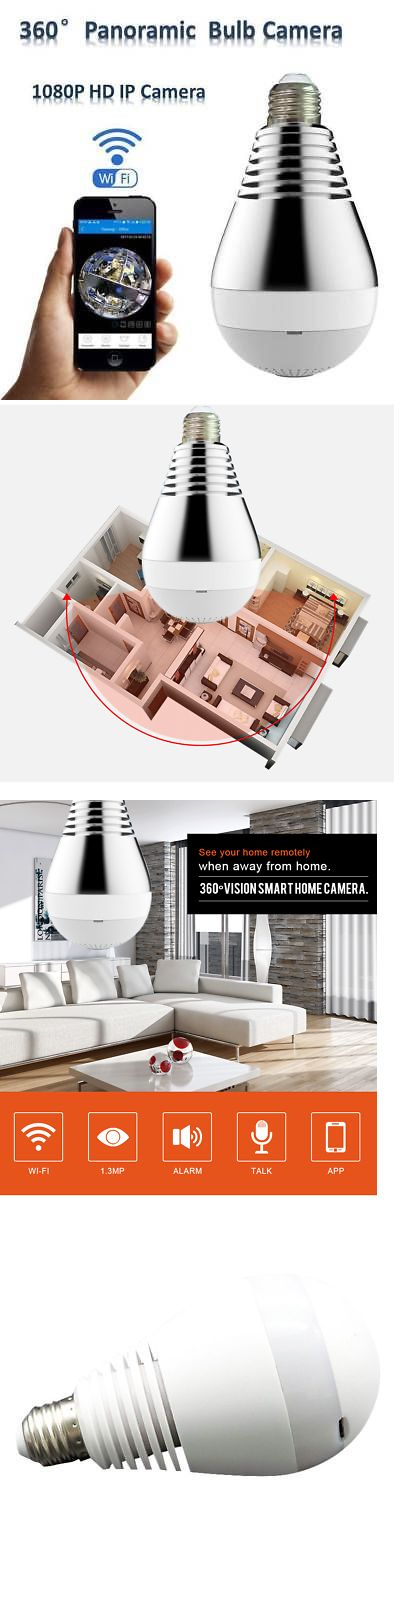 Security Cameras: Bulb Light Wireless Spy Ip Camera Wifi Fisheye 1080P 360 Degree Mini Cctv V380 -> BUY IT NOW ONLY: $47.22 on eBay!